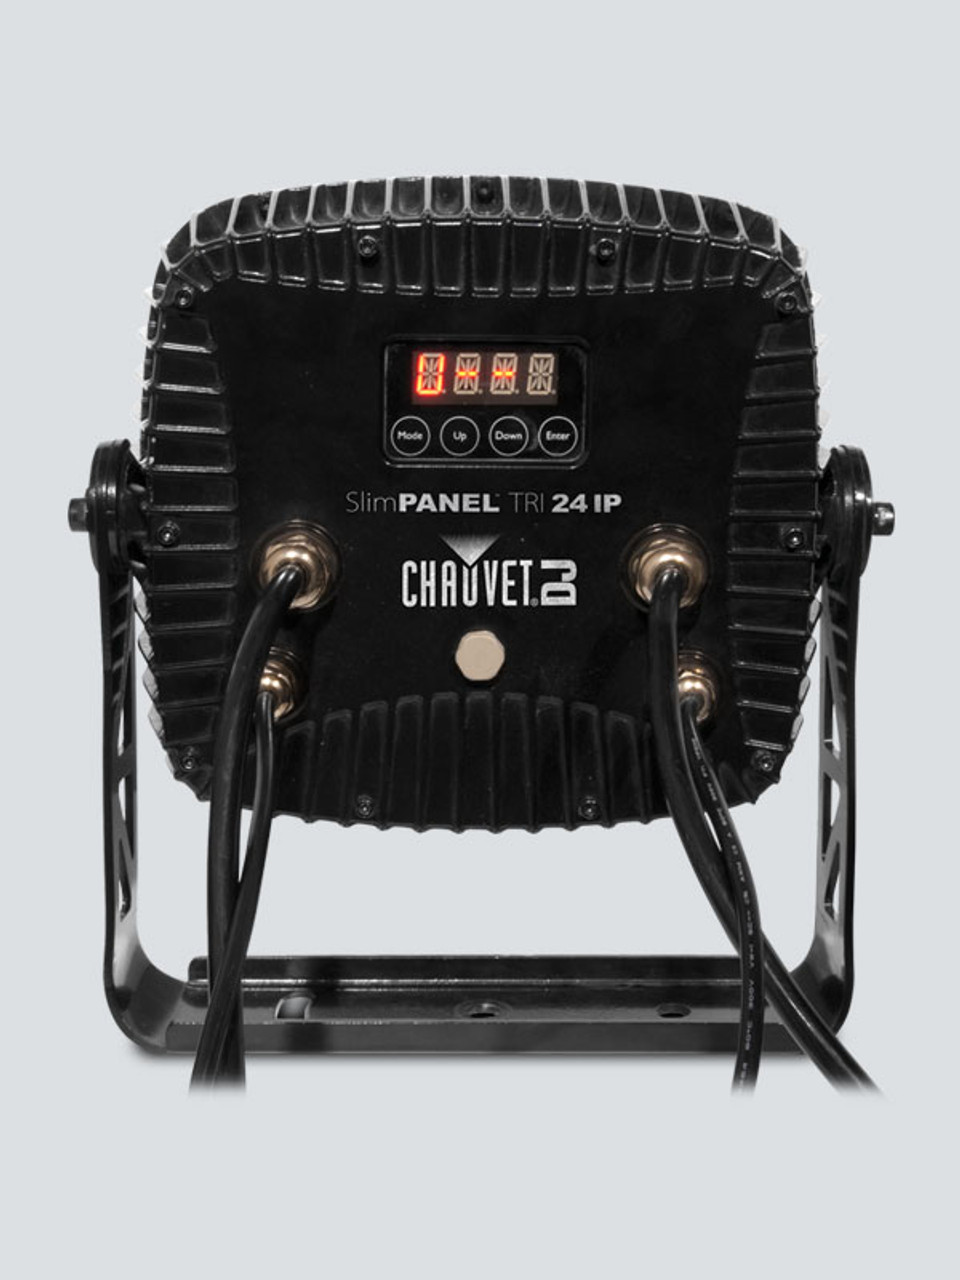 SlimPANEL Tri 24 IP